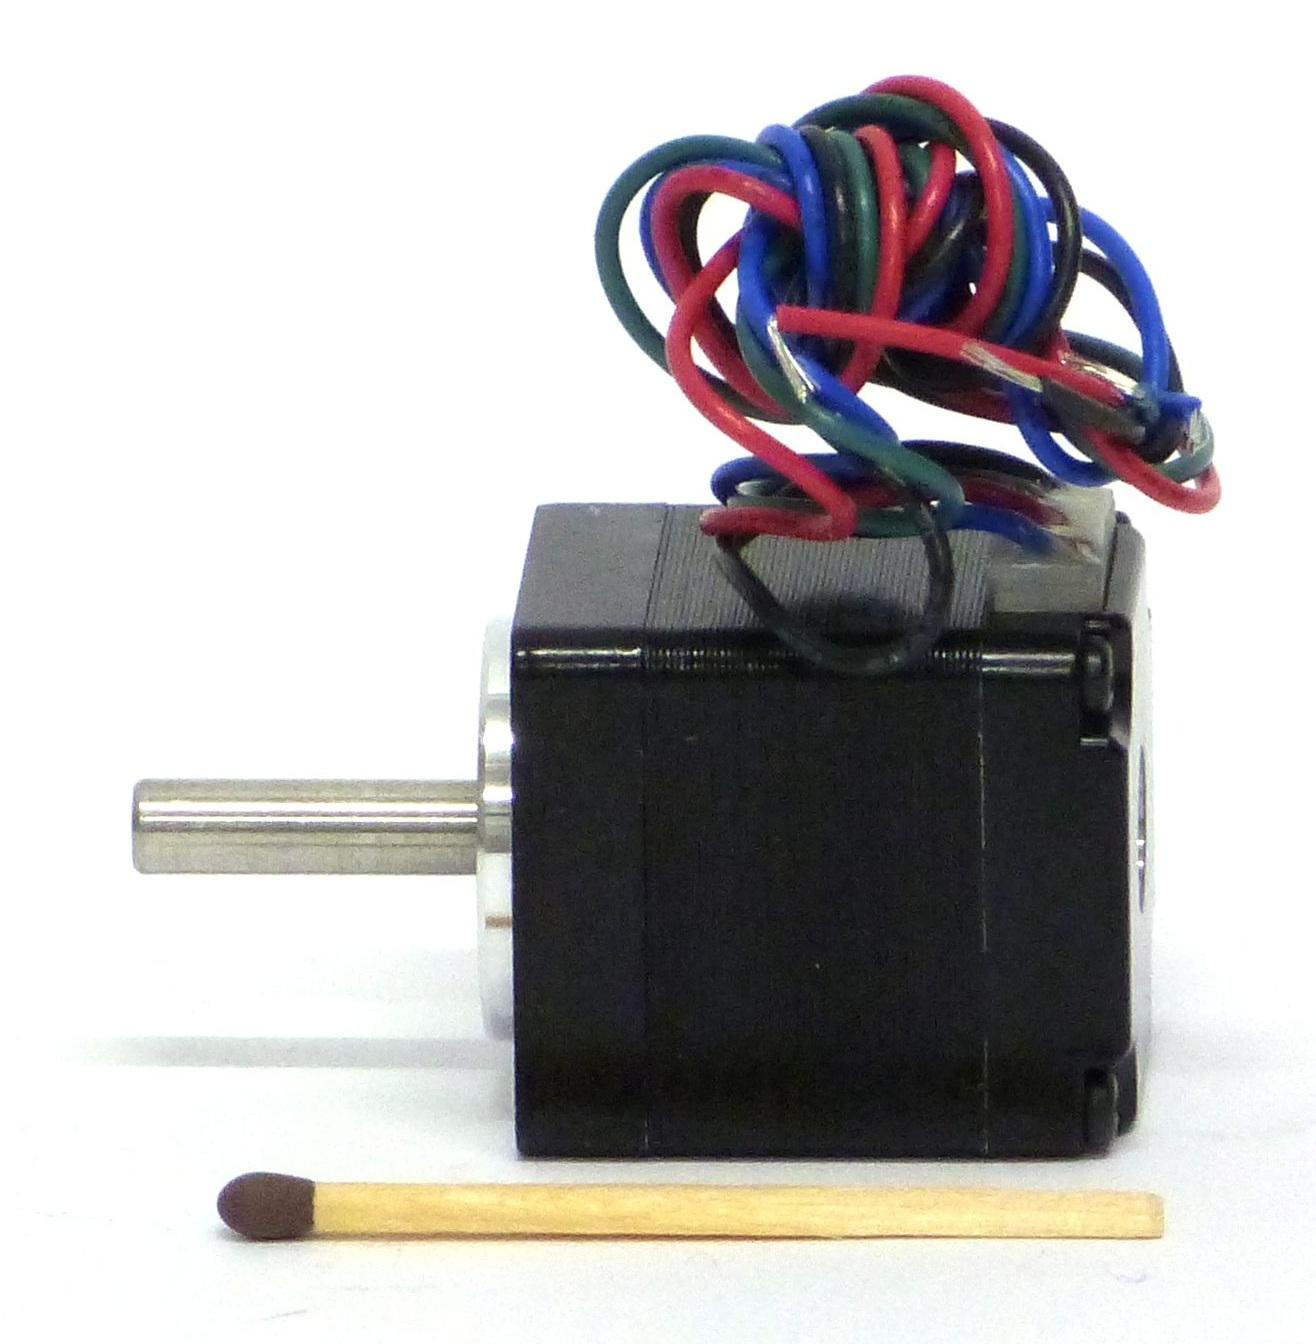 Inside look of a mini stepper motor from danish company JVL